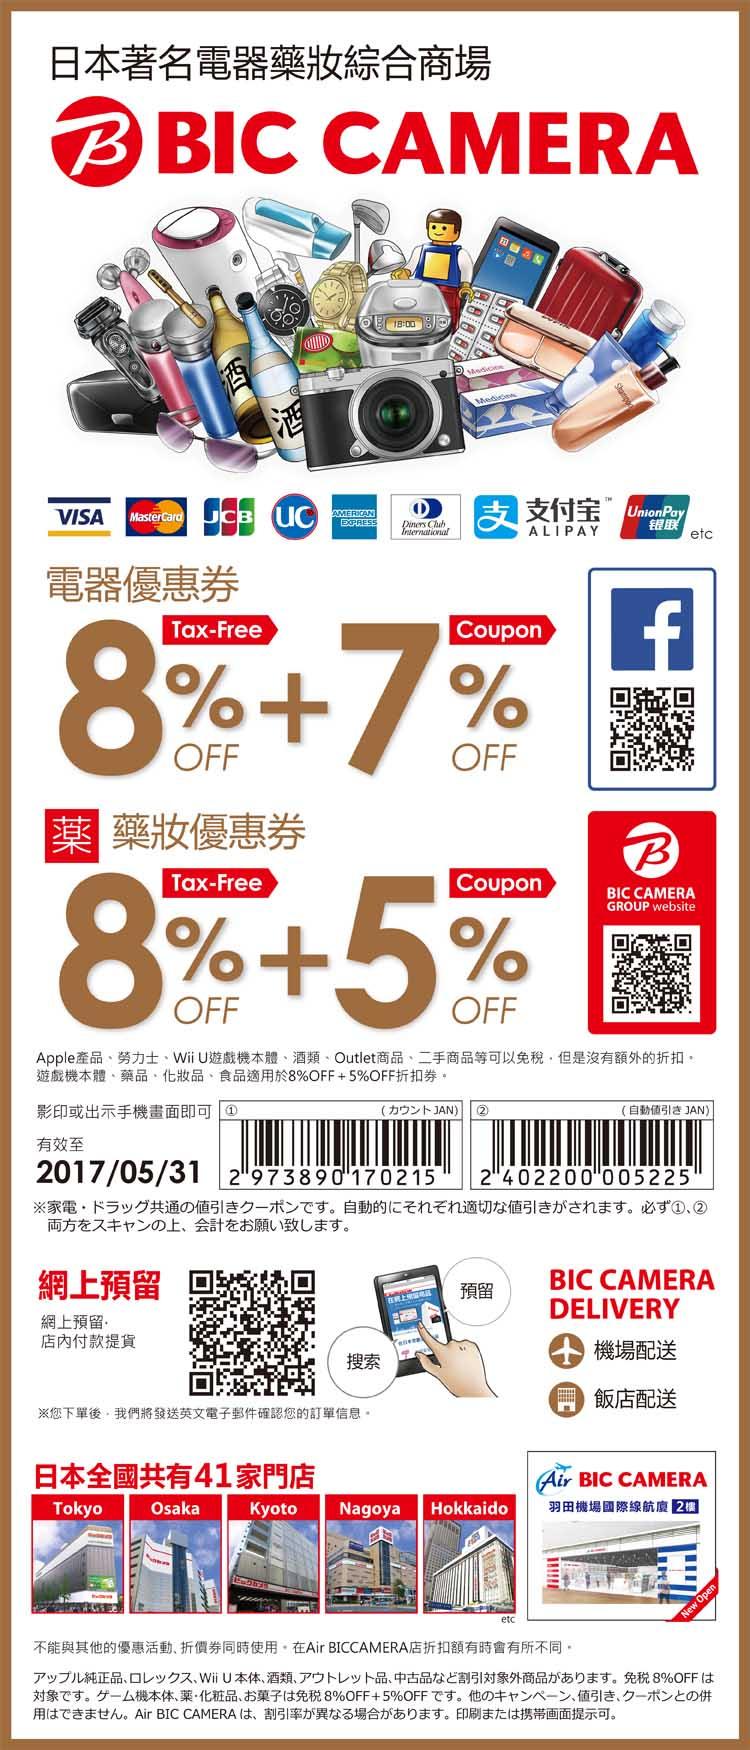 BIC CAMERA 免税8%+優待6% OFF 優惠折價券免費下載|日本最大3C賣場!相機藥妝紅酒精品超好買!